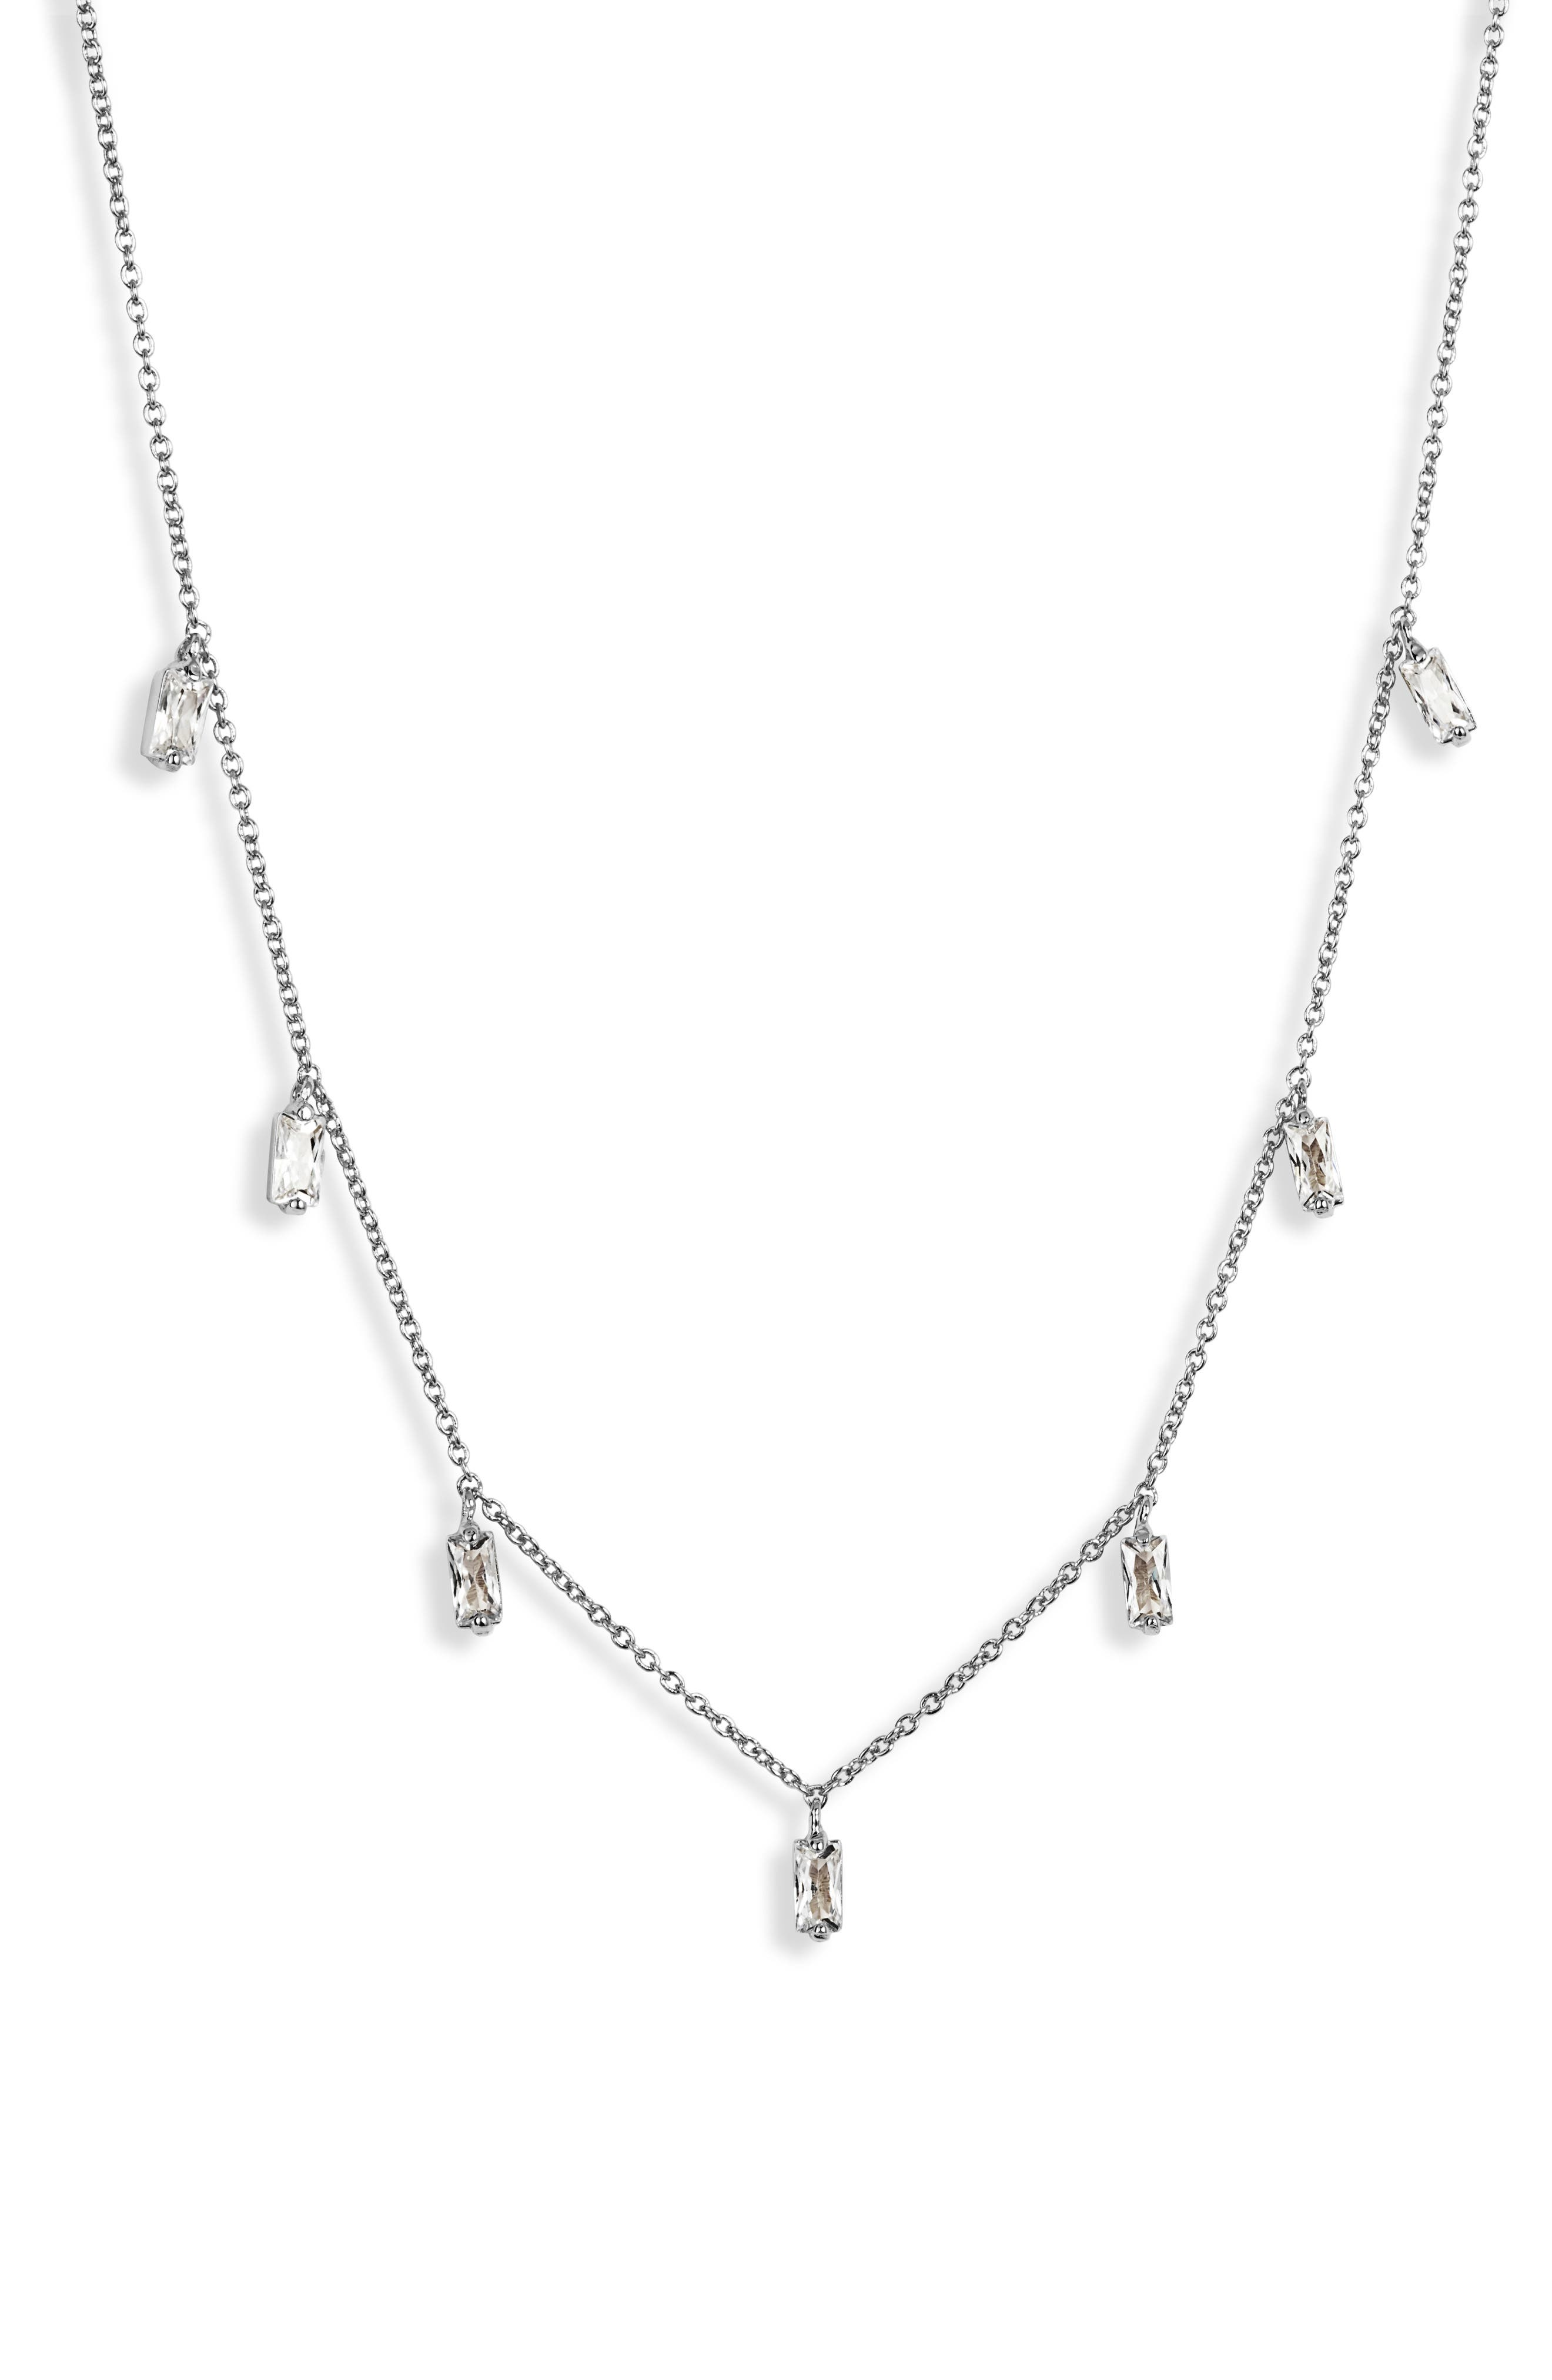 GORJANA Amara Crystal Fringe Necklace, Main, color, SILVER